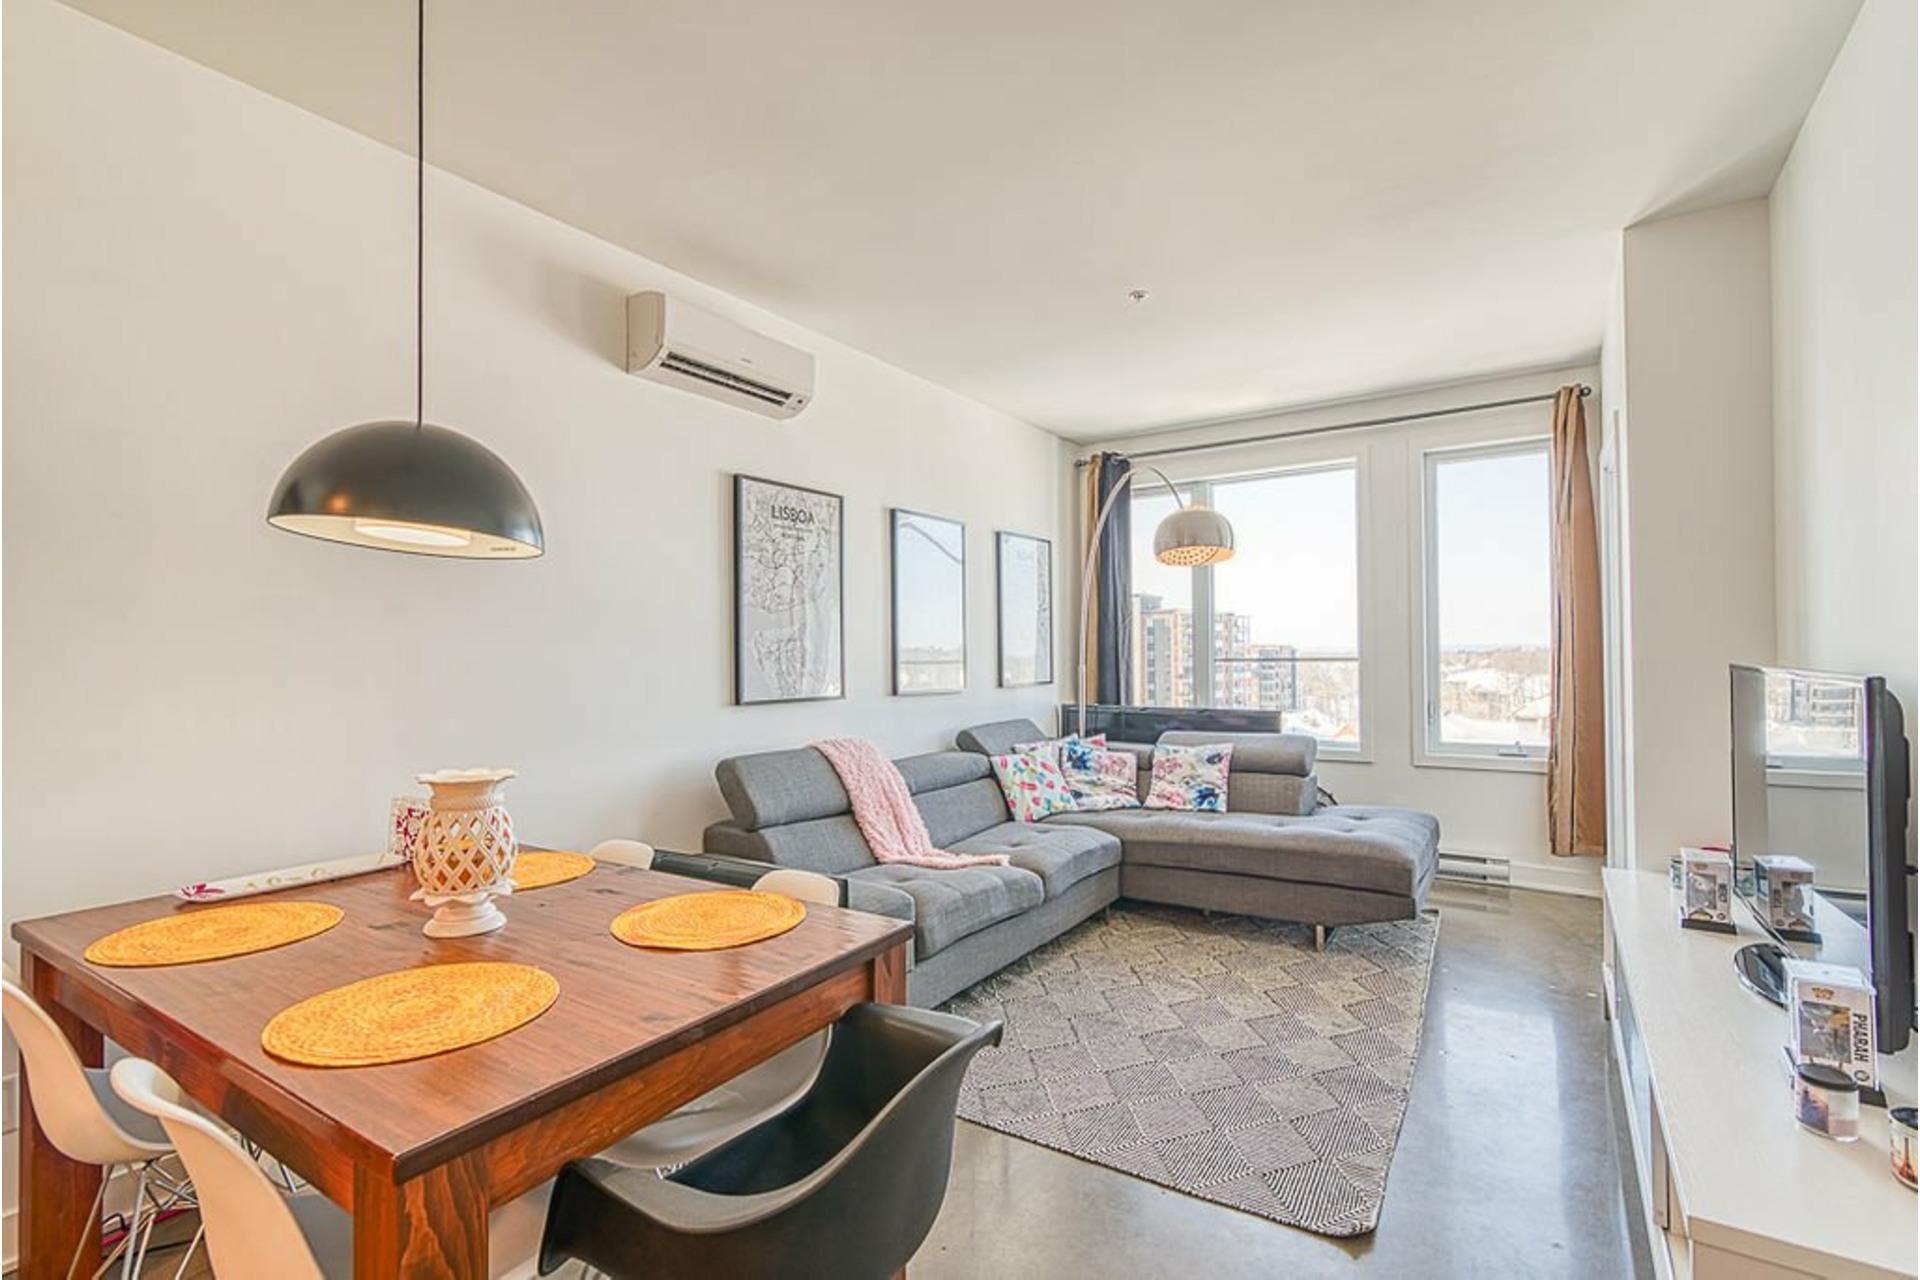 image 8 - Apartment For sale Blainville - 4 rooms